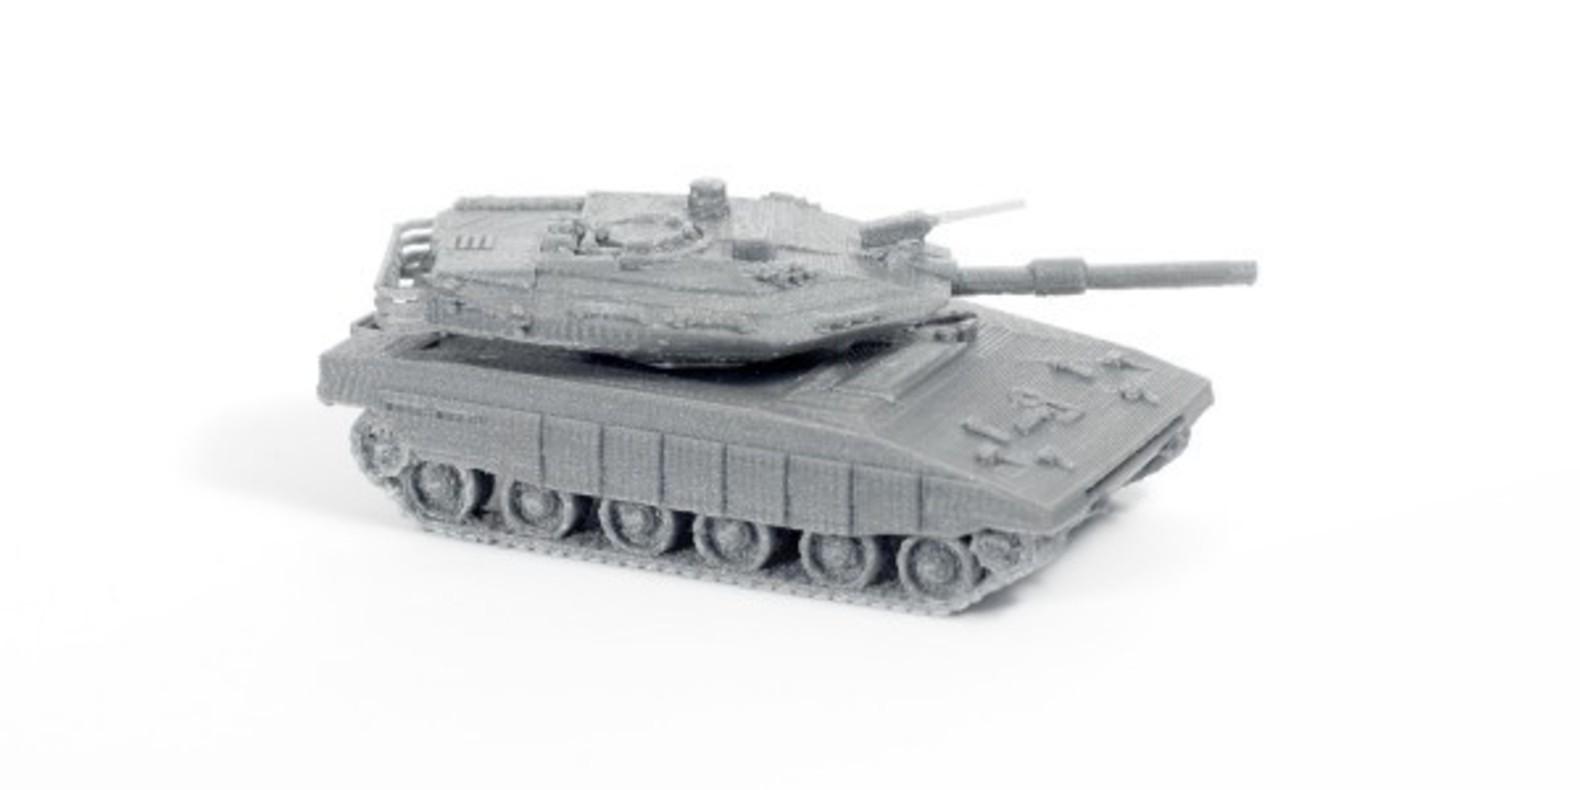 tanks-duc-tran-formbyte-fichier-3d-stl-gratuit-cults-5